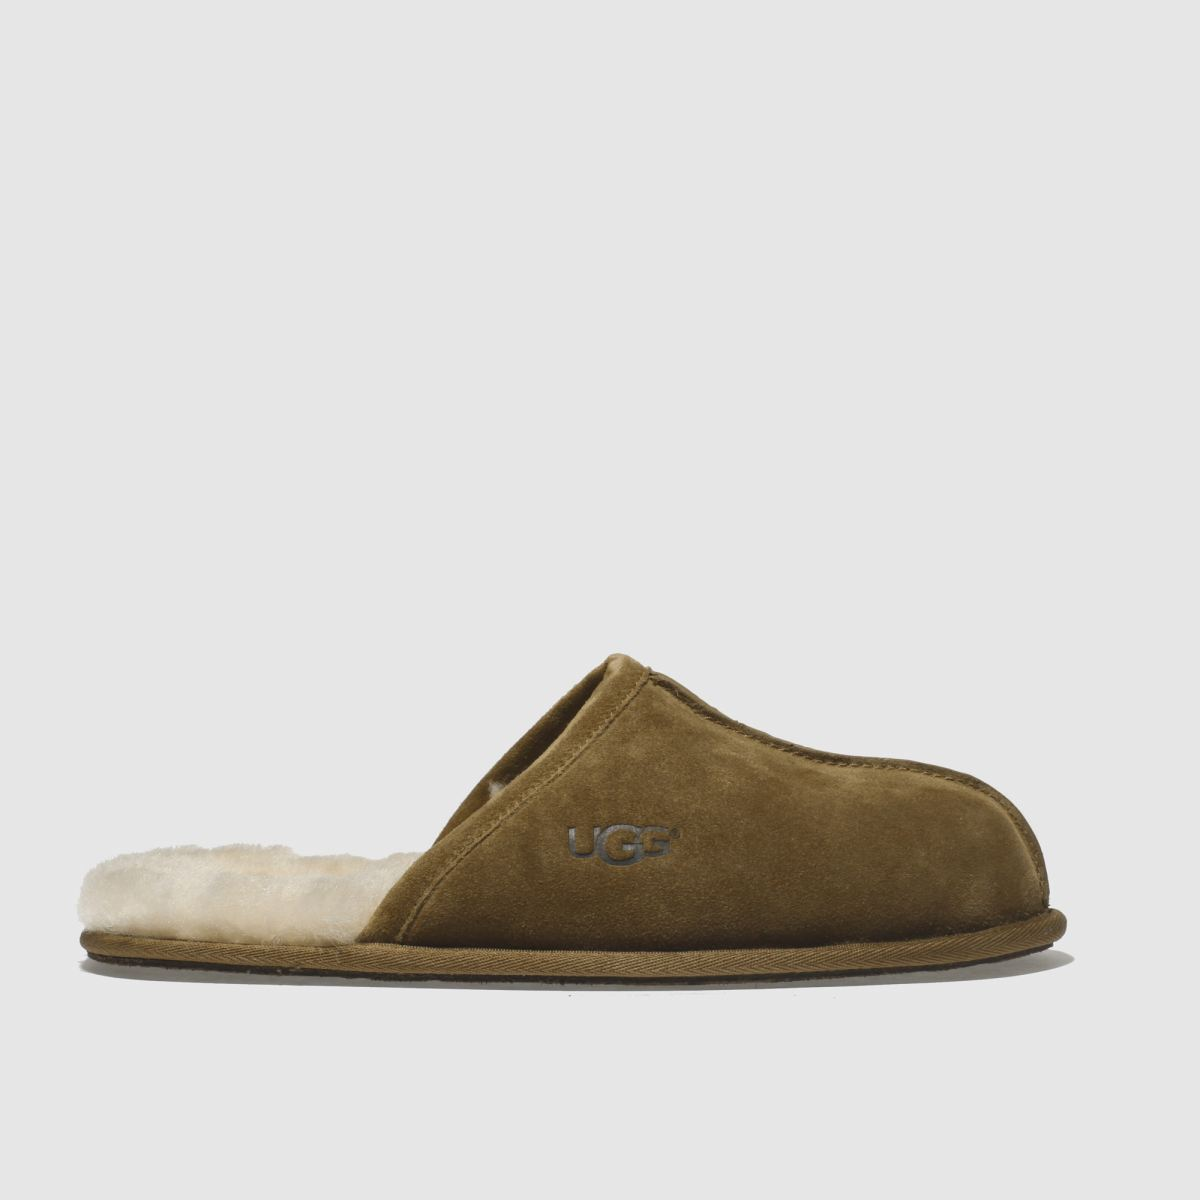 Ugg Tan Scuff Slippers